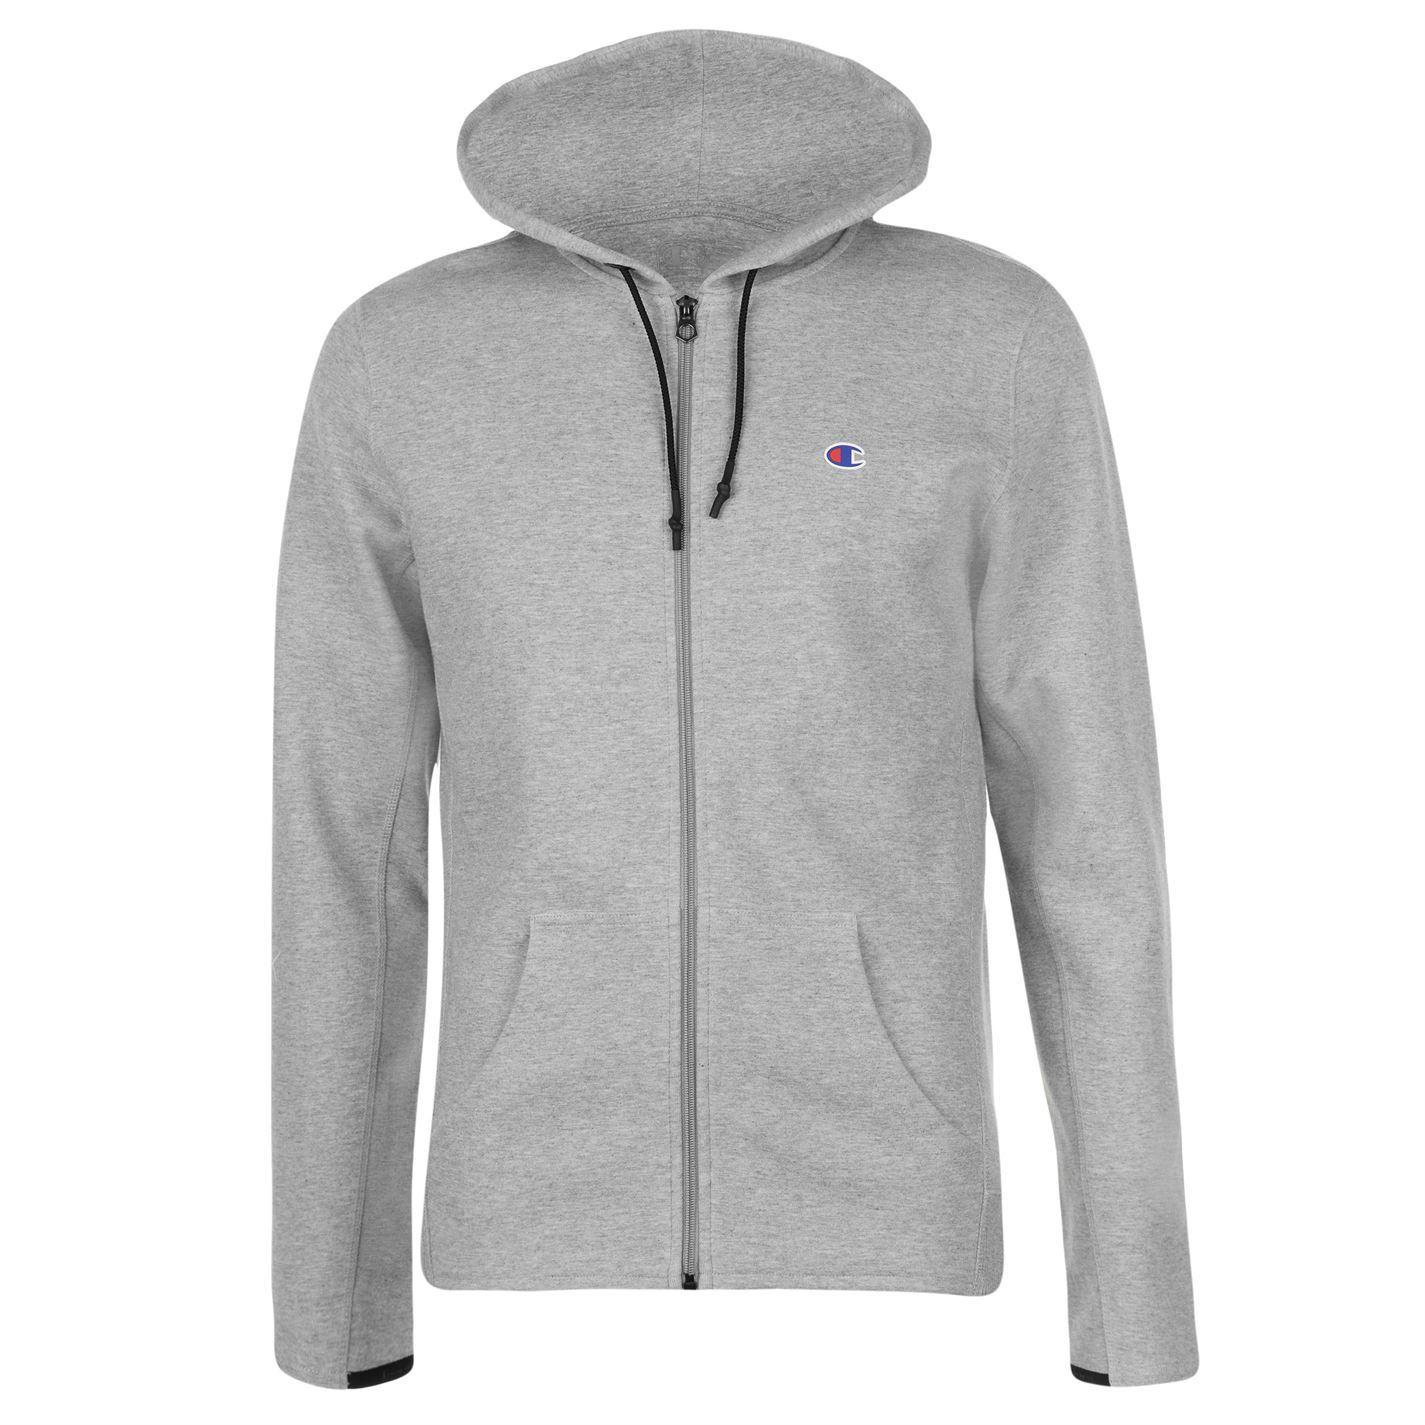 Champion-Interlock-Full-Zip-Hoody-Mens-Hoodie-Top-Sweatshirt-Sweater thumbnail 9